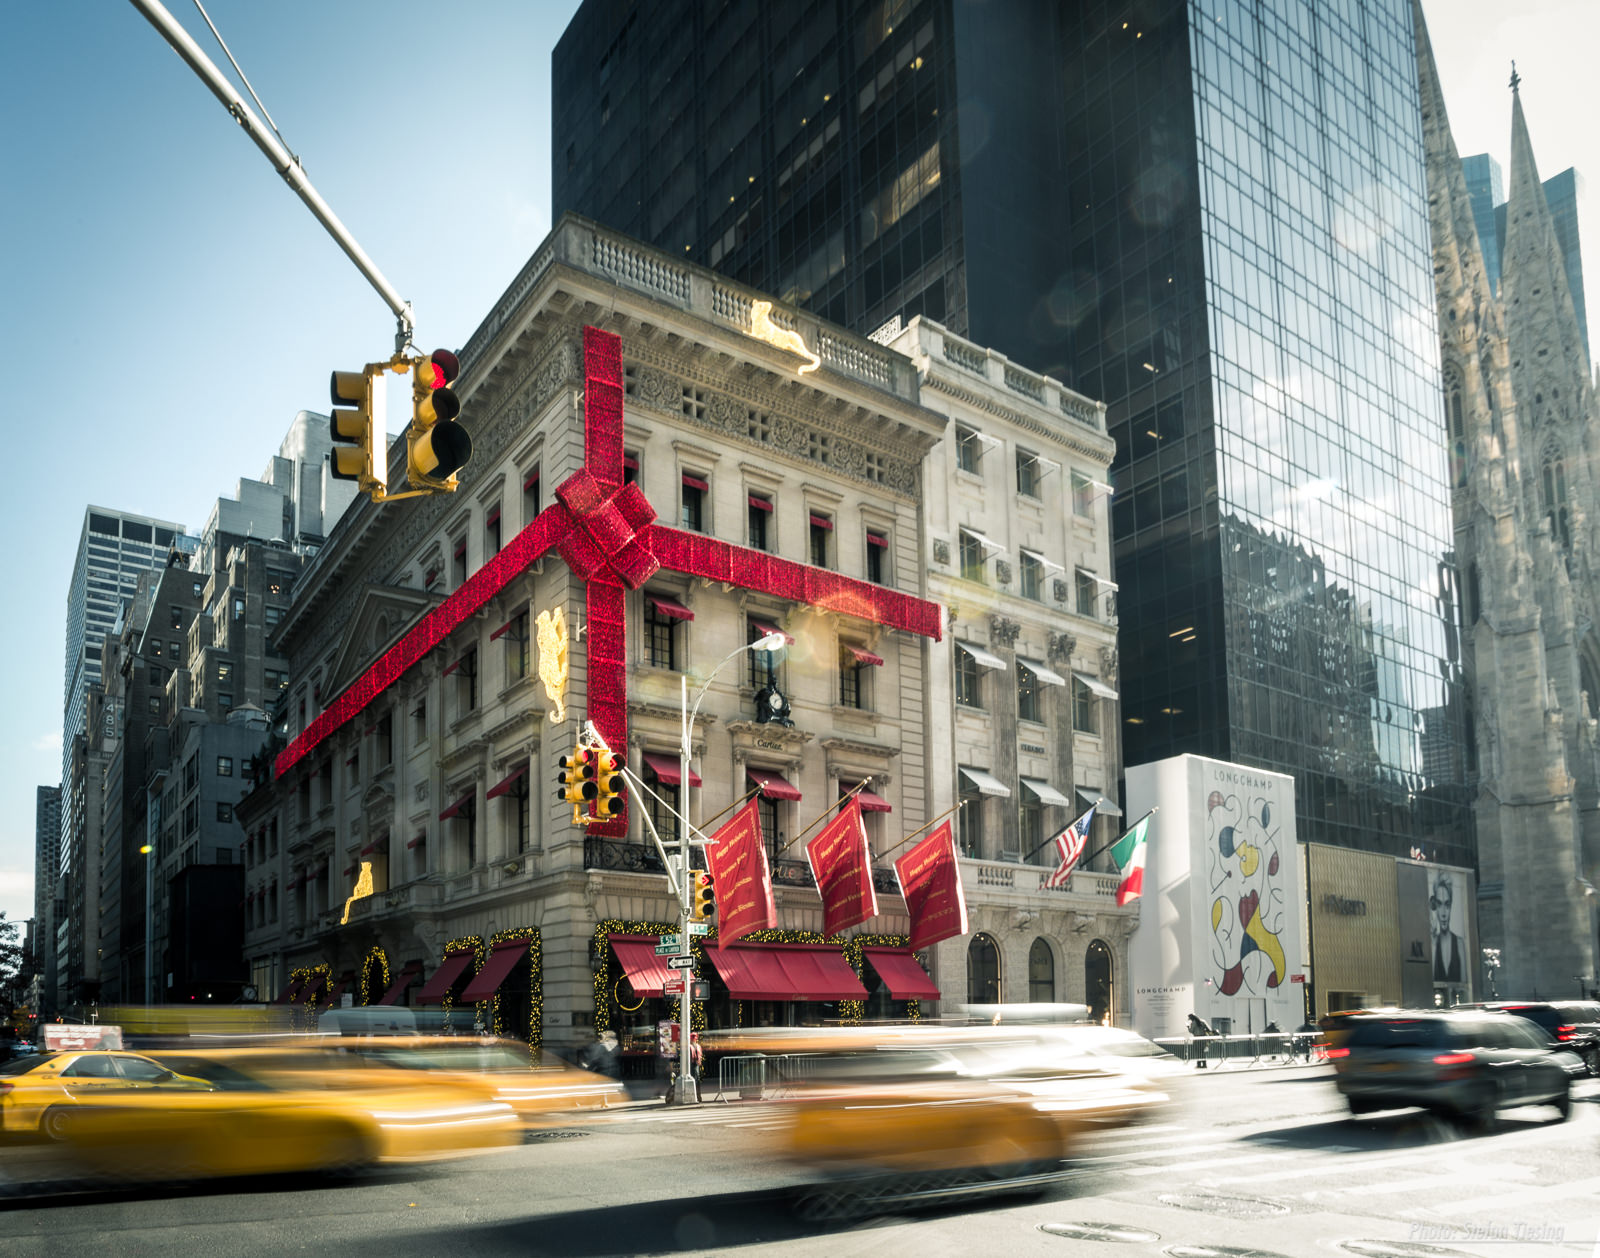 Xmas at Place de Cartier (5th Avenue, New York)